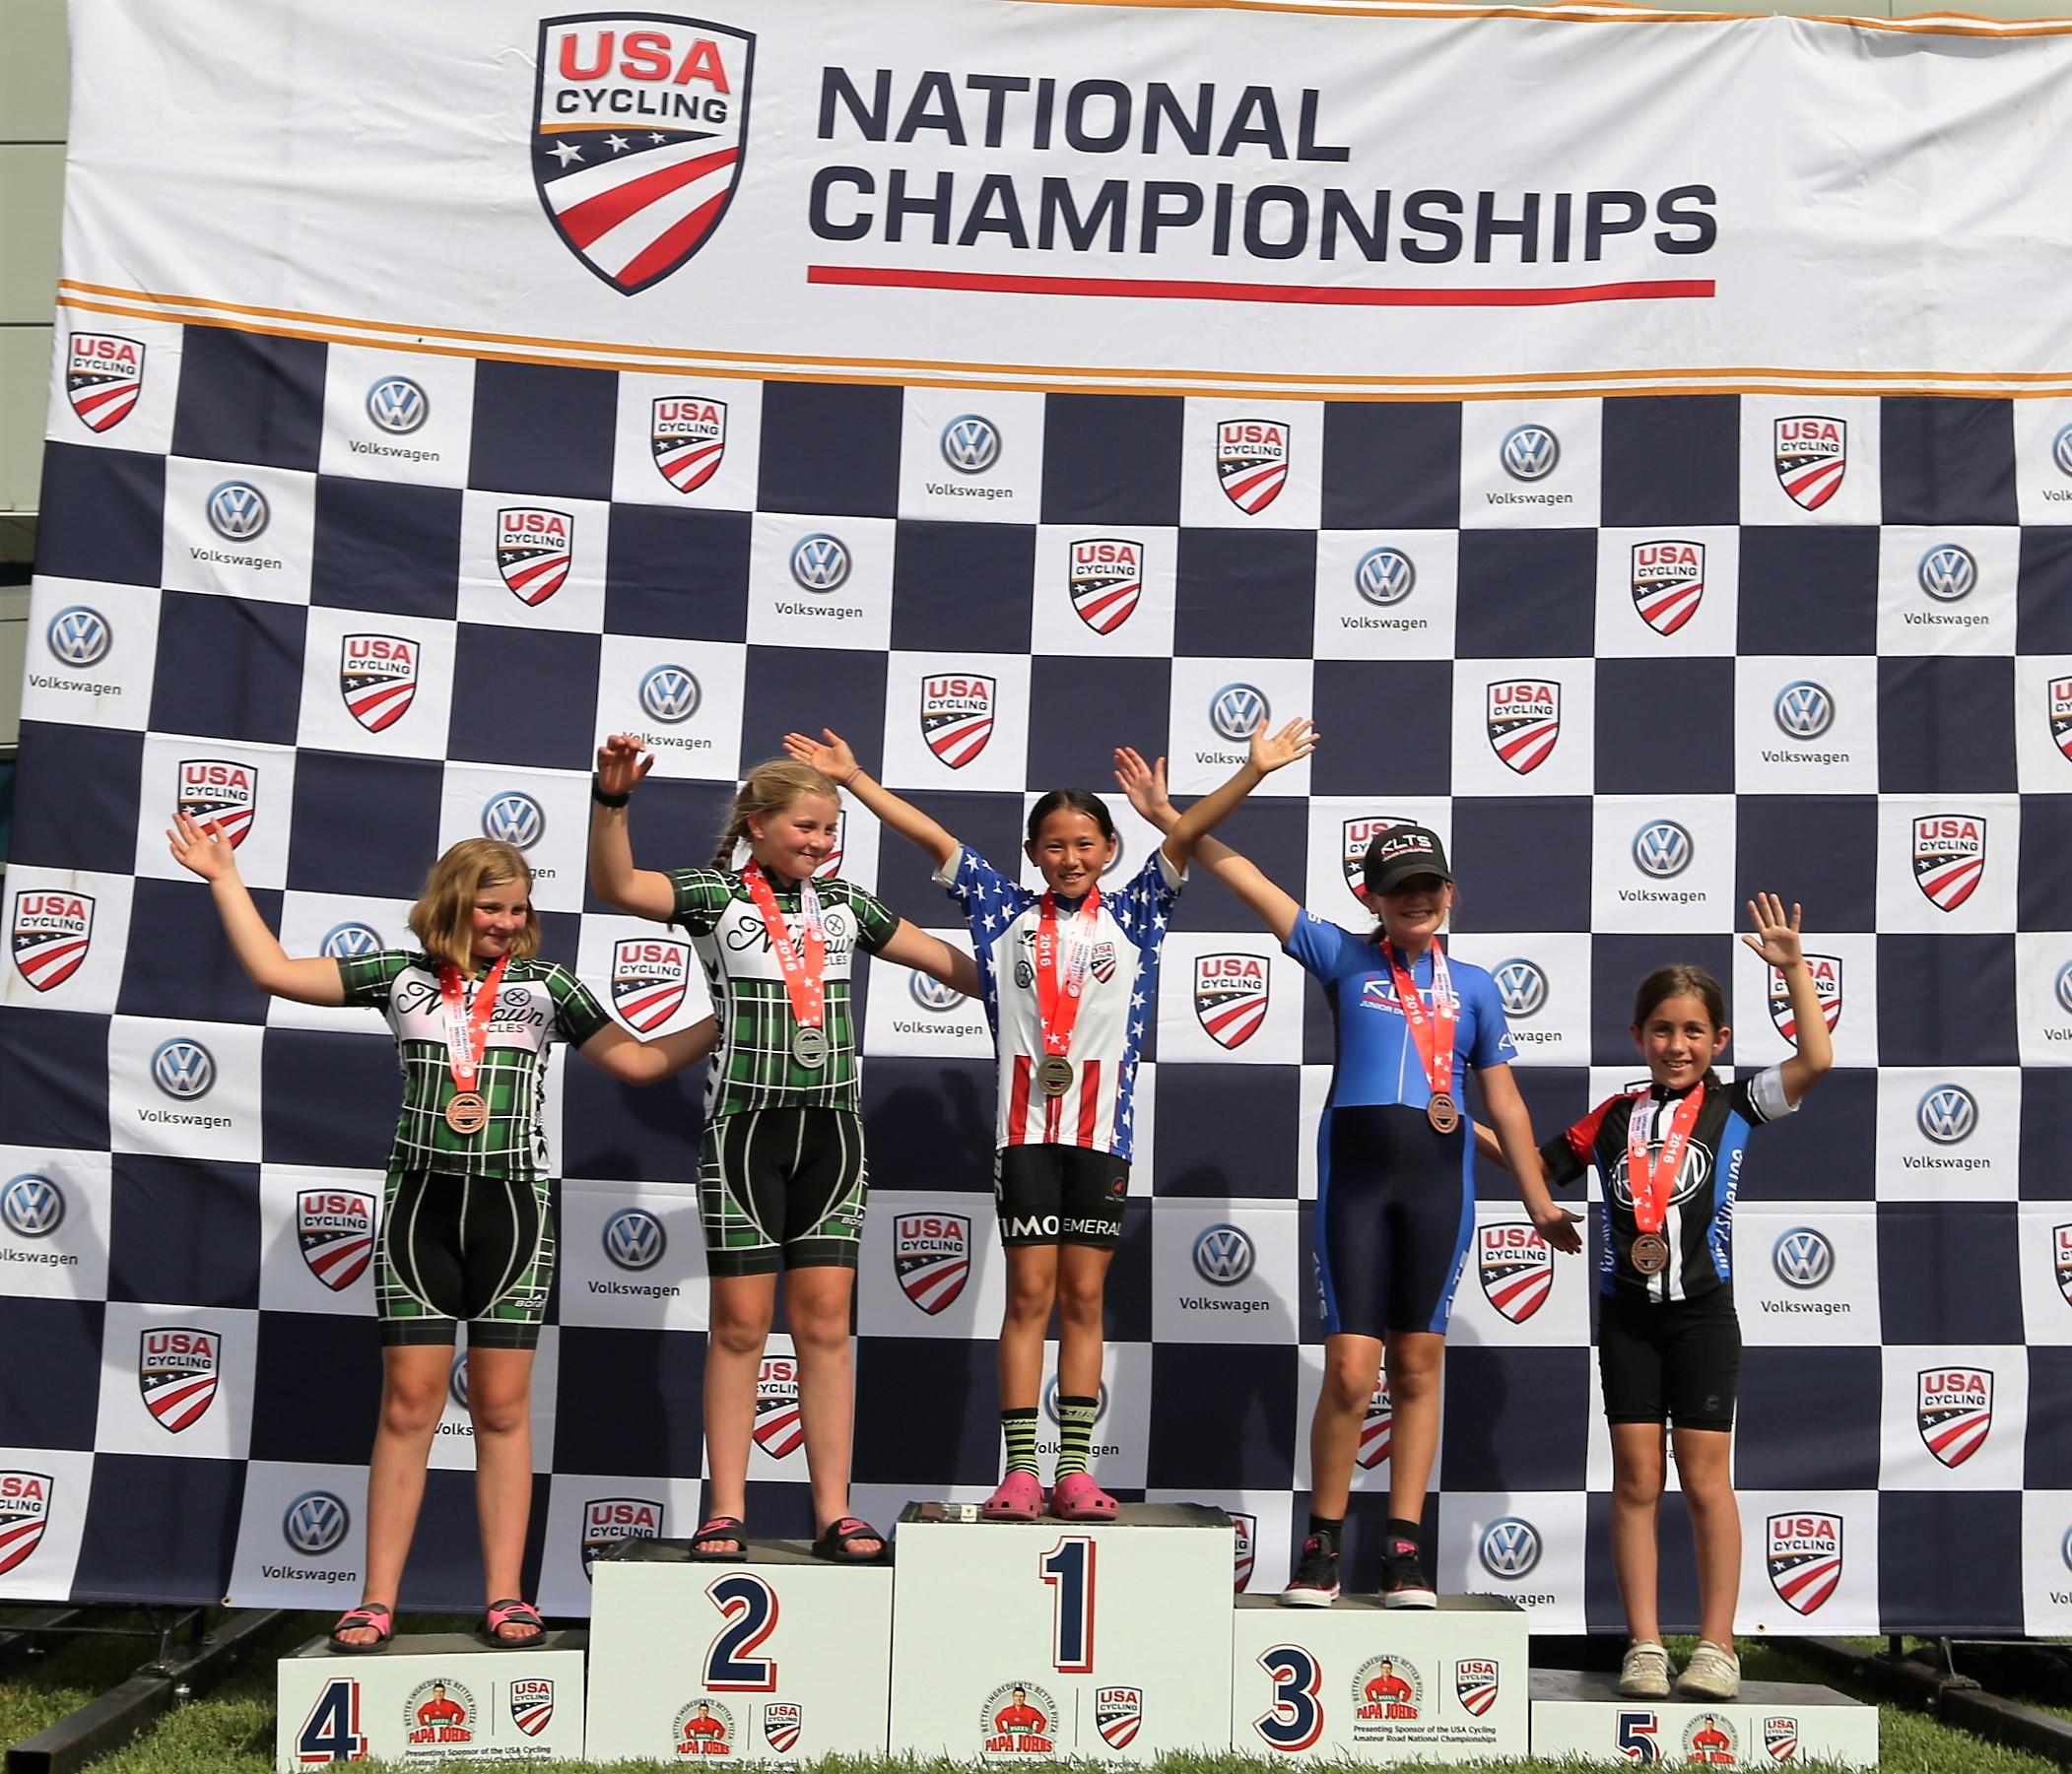 2016 Nation Road Race Championship